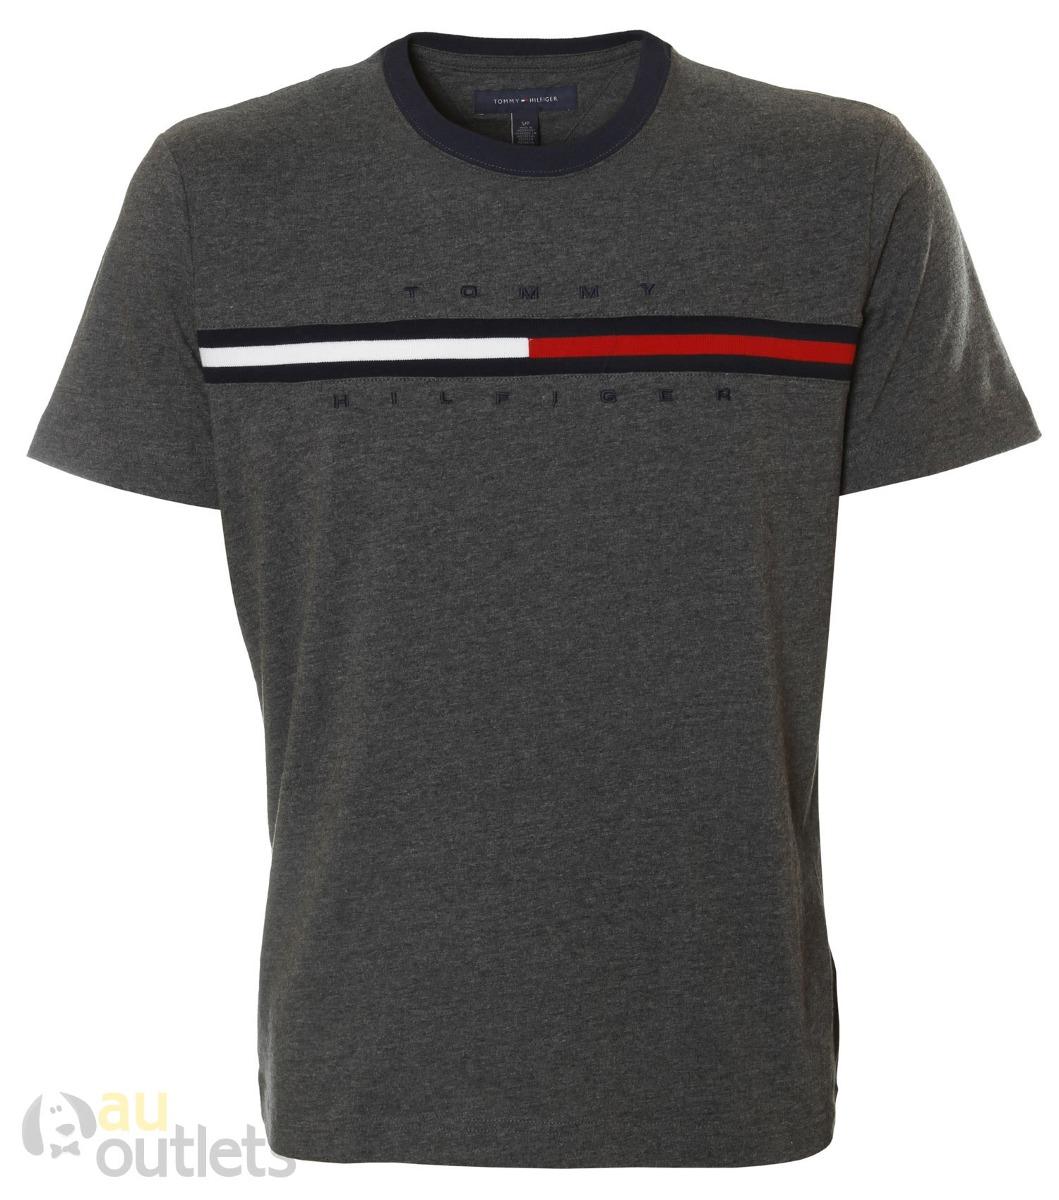 50a3789d23ed2 camiseta masculina tommy hilfiger plumbee. Carregando zoom.